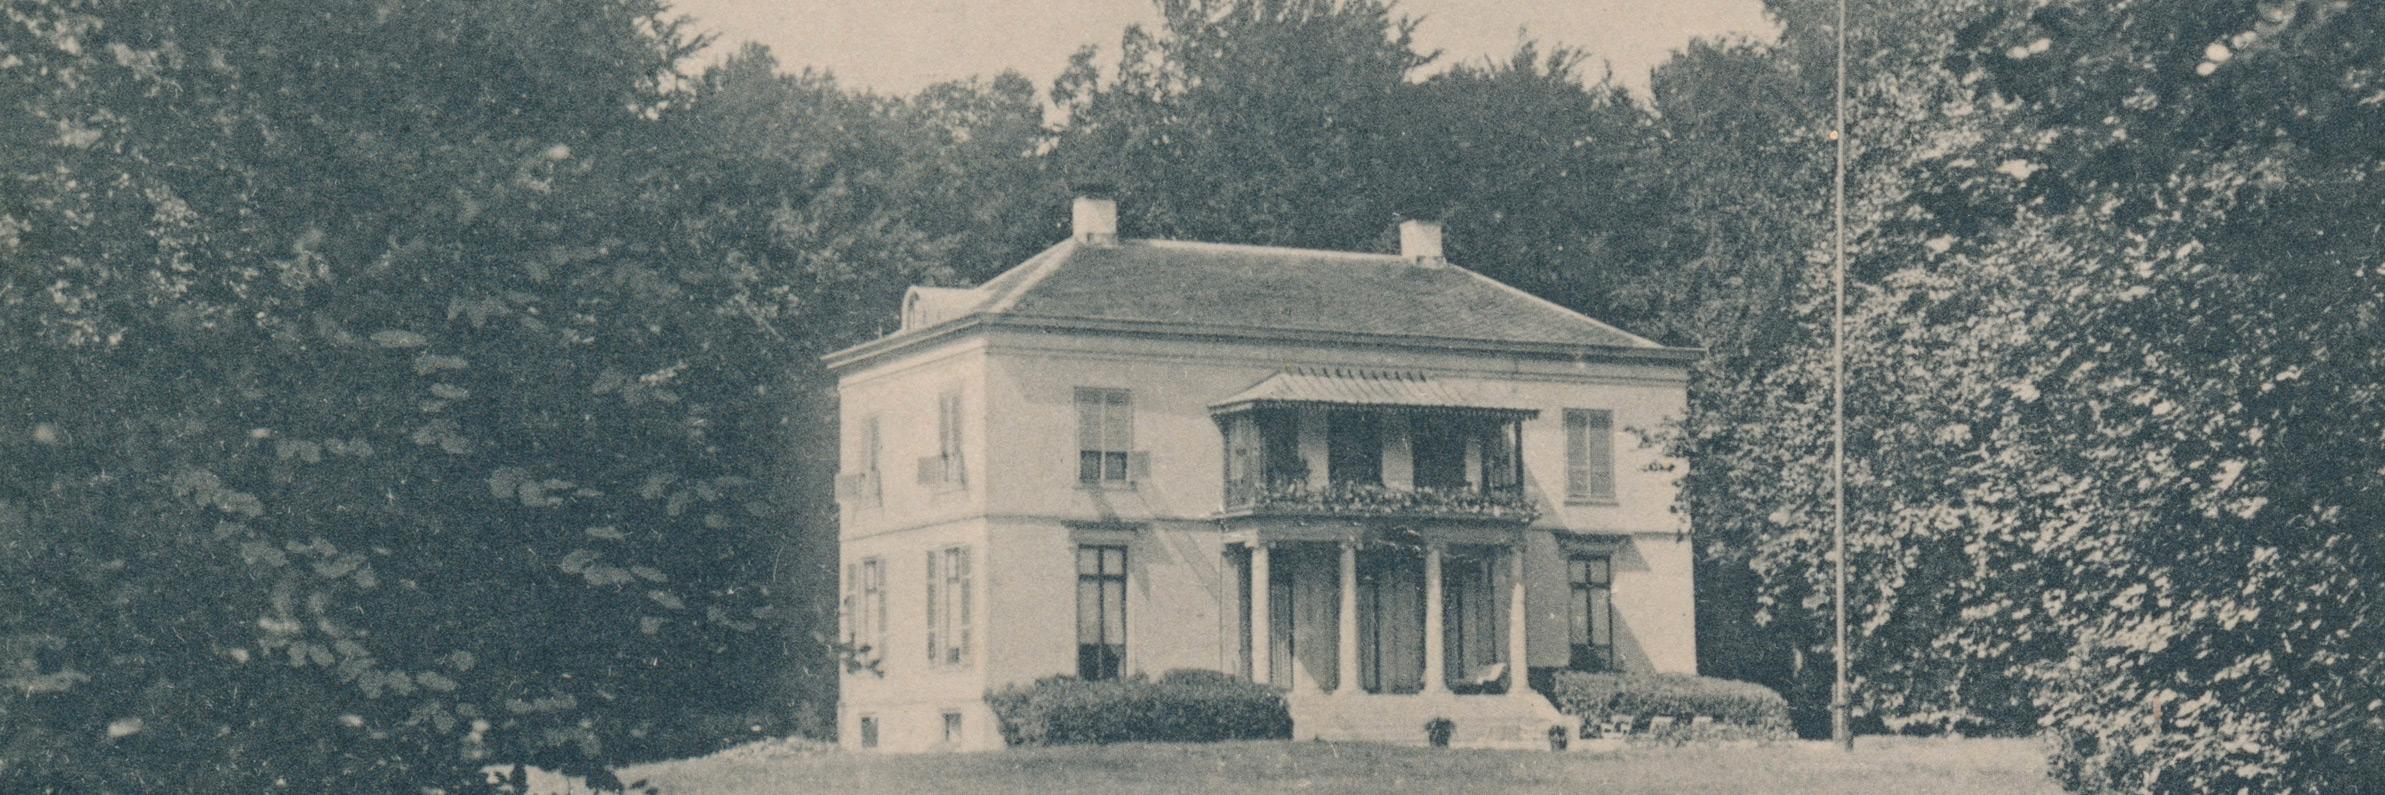 Historie Landgoed Pijnenburg